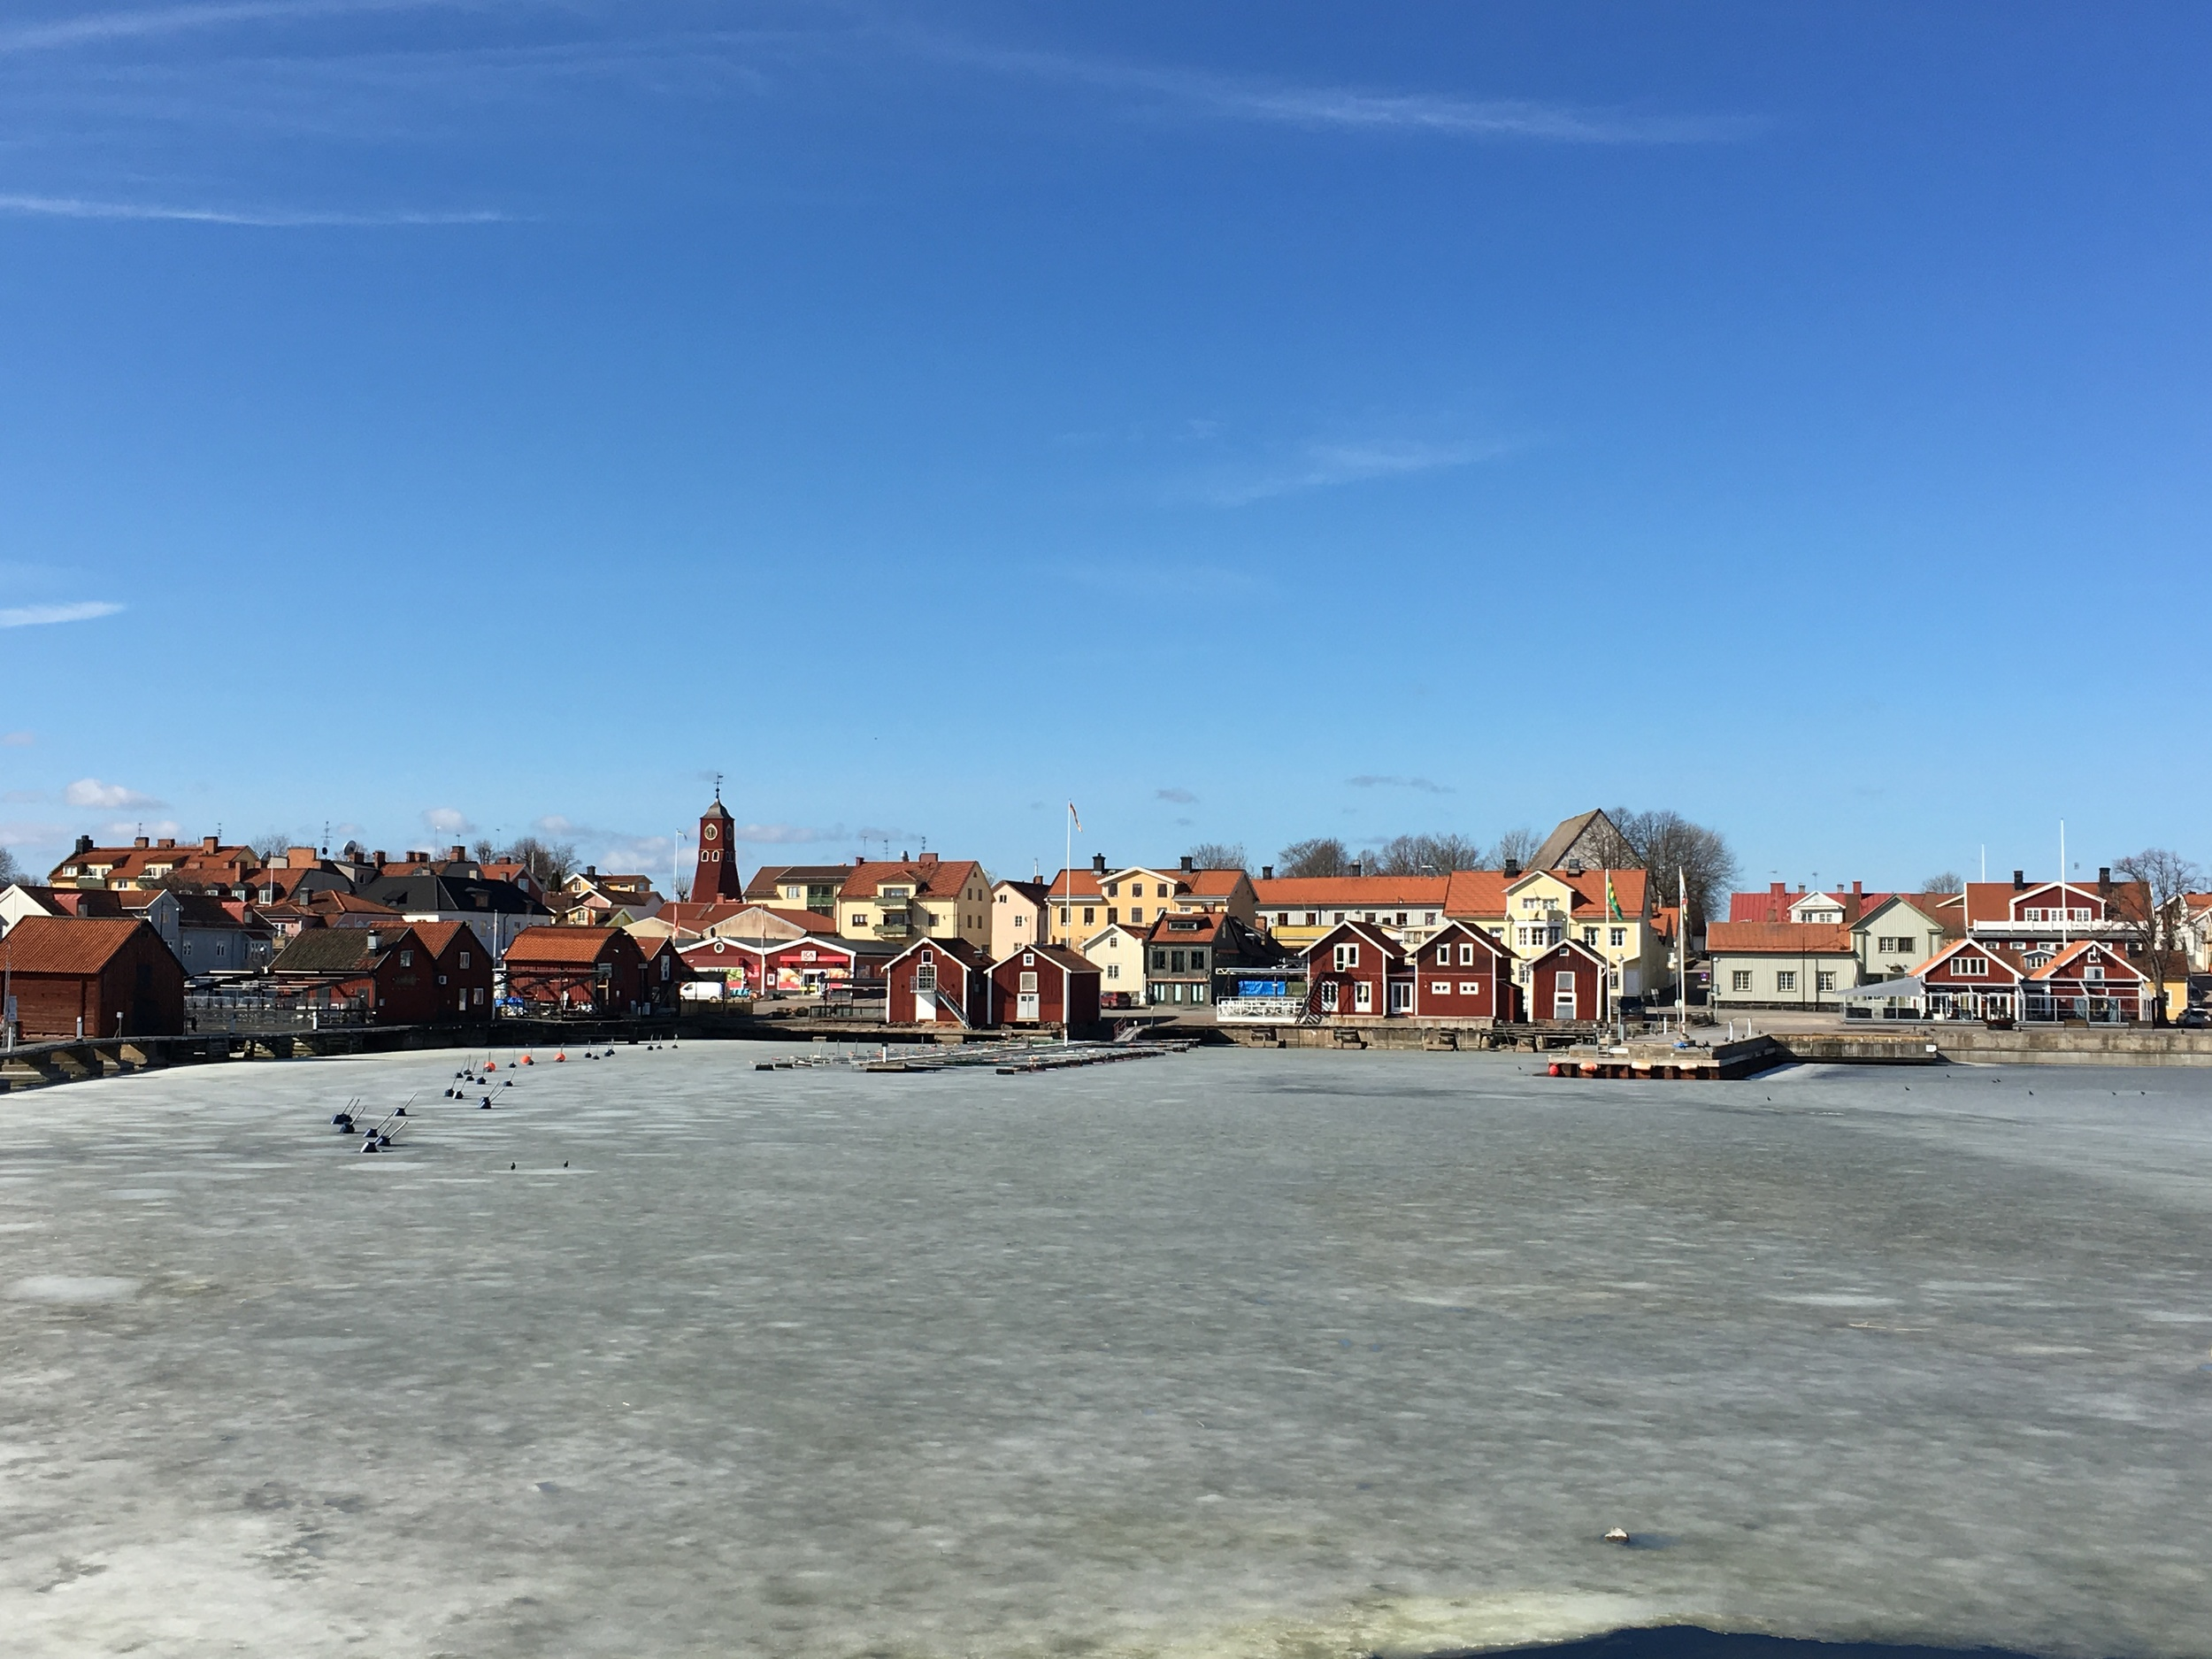 A trip to Öregrundthe Monday after Easter